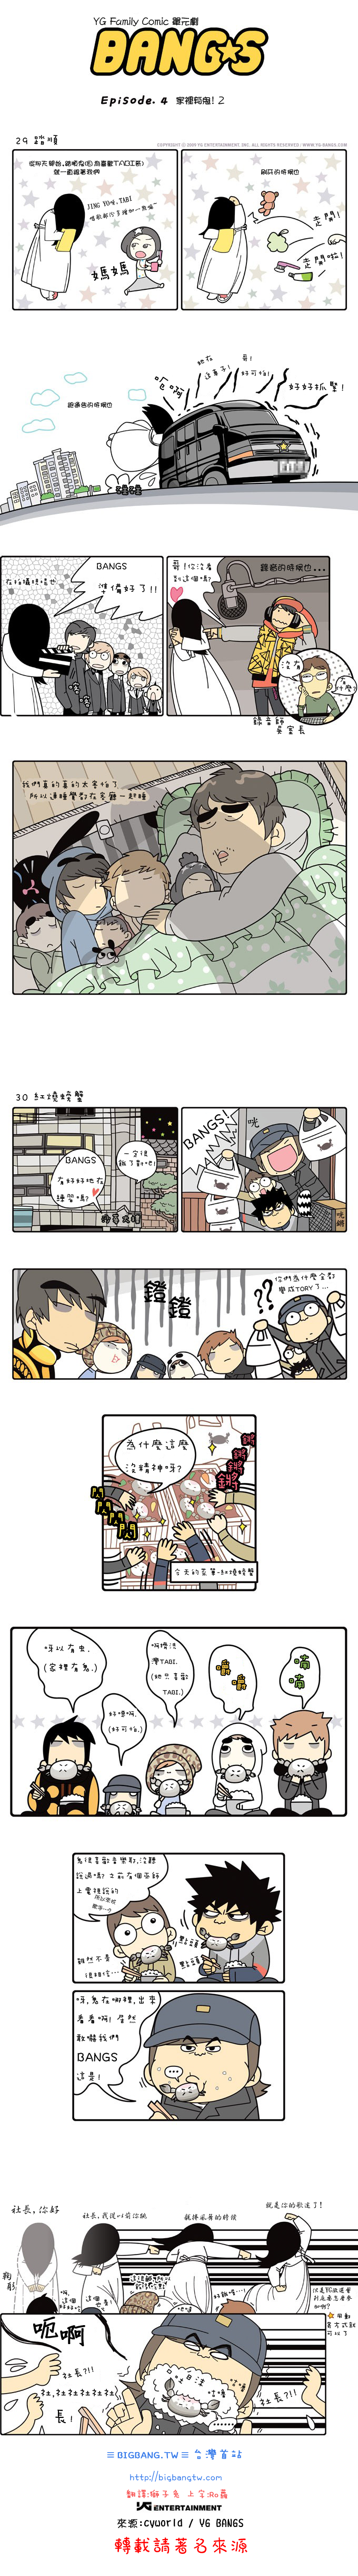 中譯 20090408_Episode 4_家裡有鬼 029-030.png